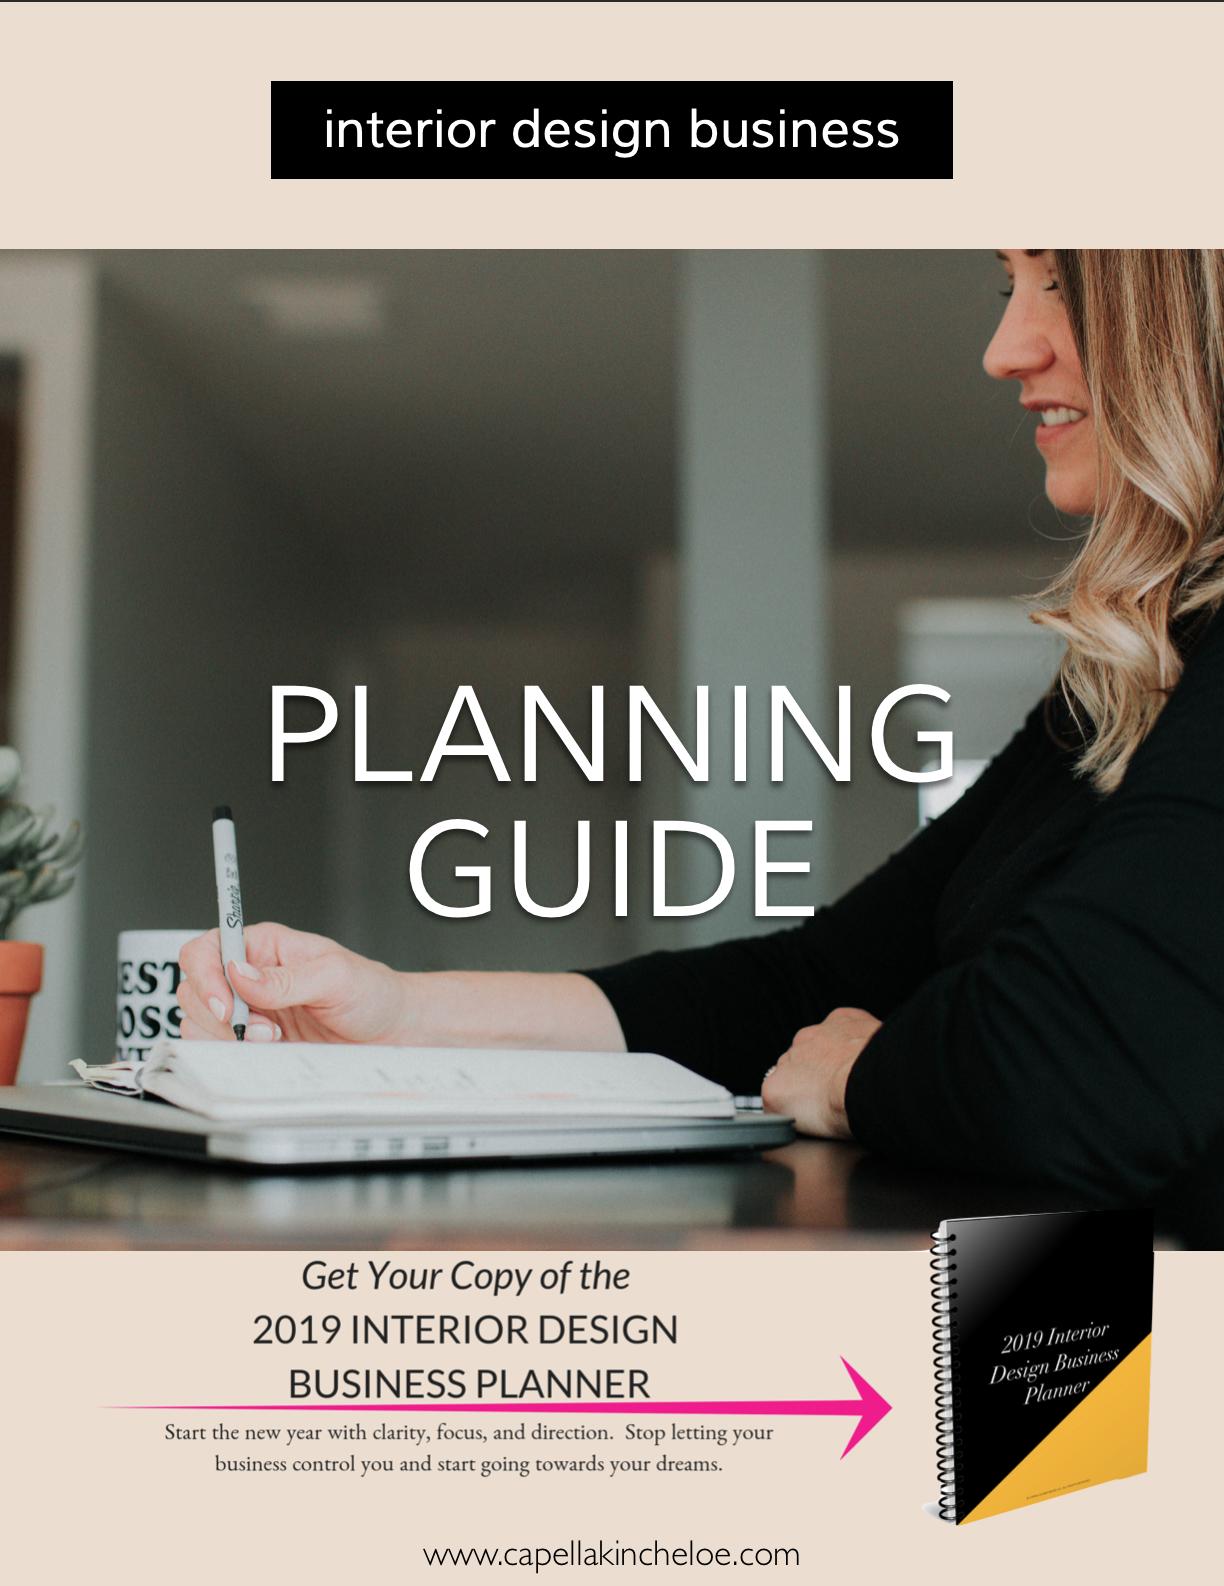 2019 Interior Design Business Planner Interior Design Business